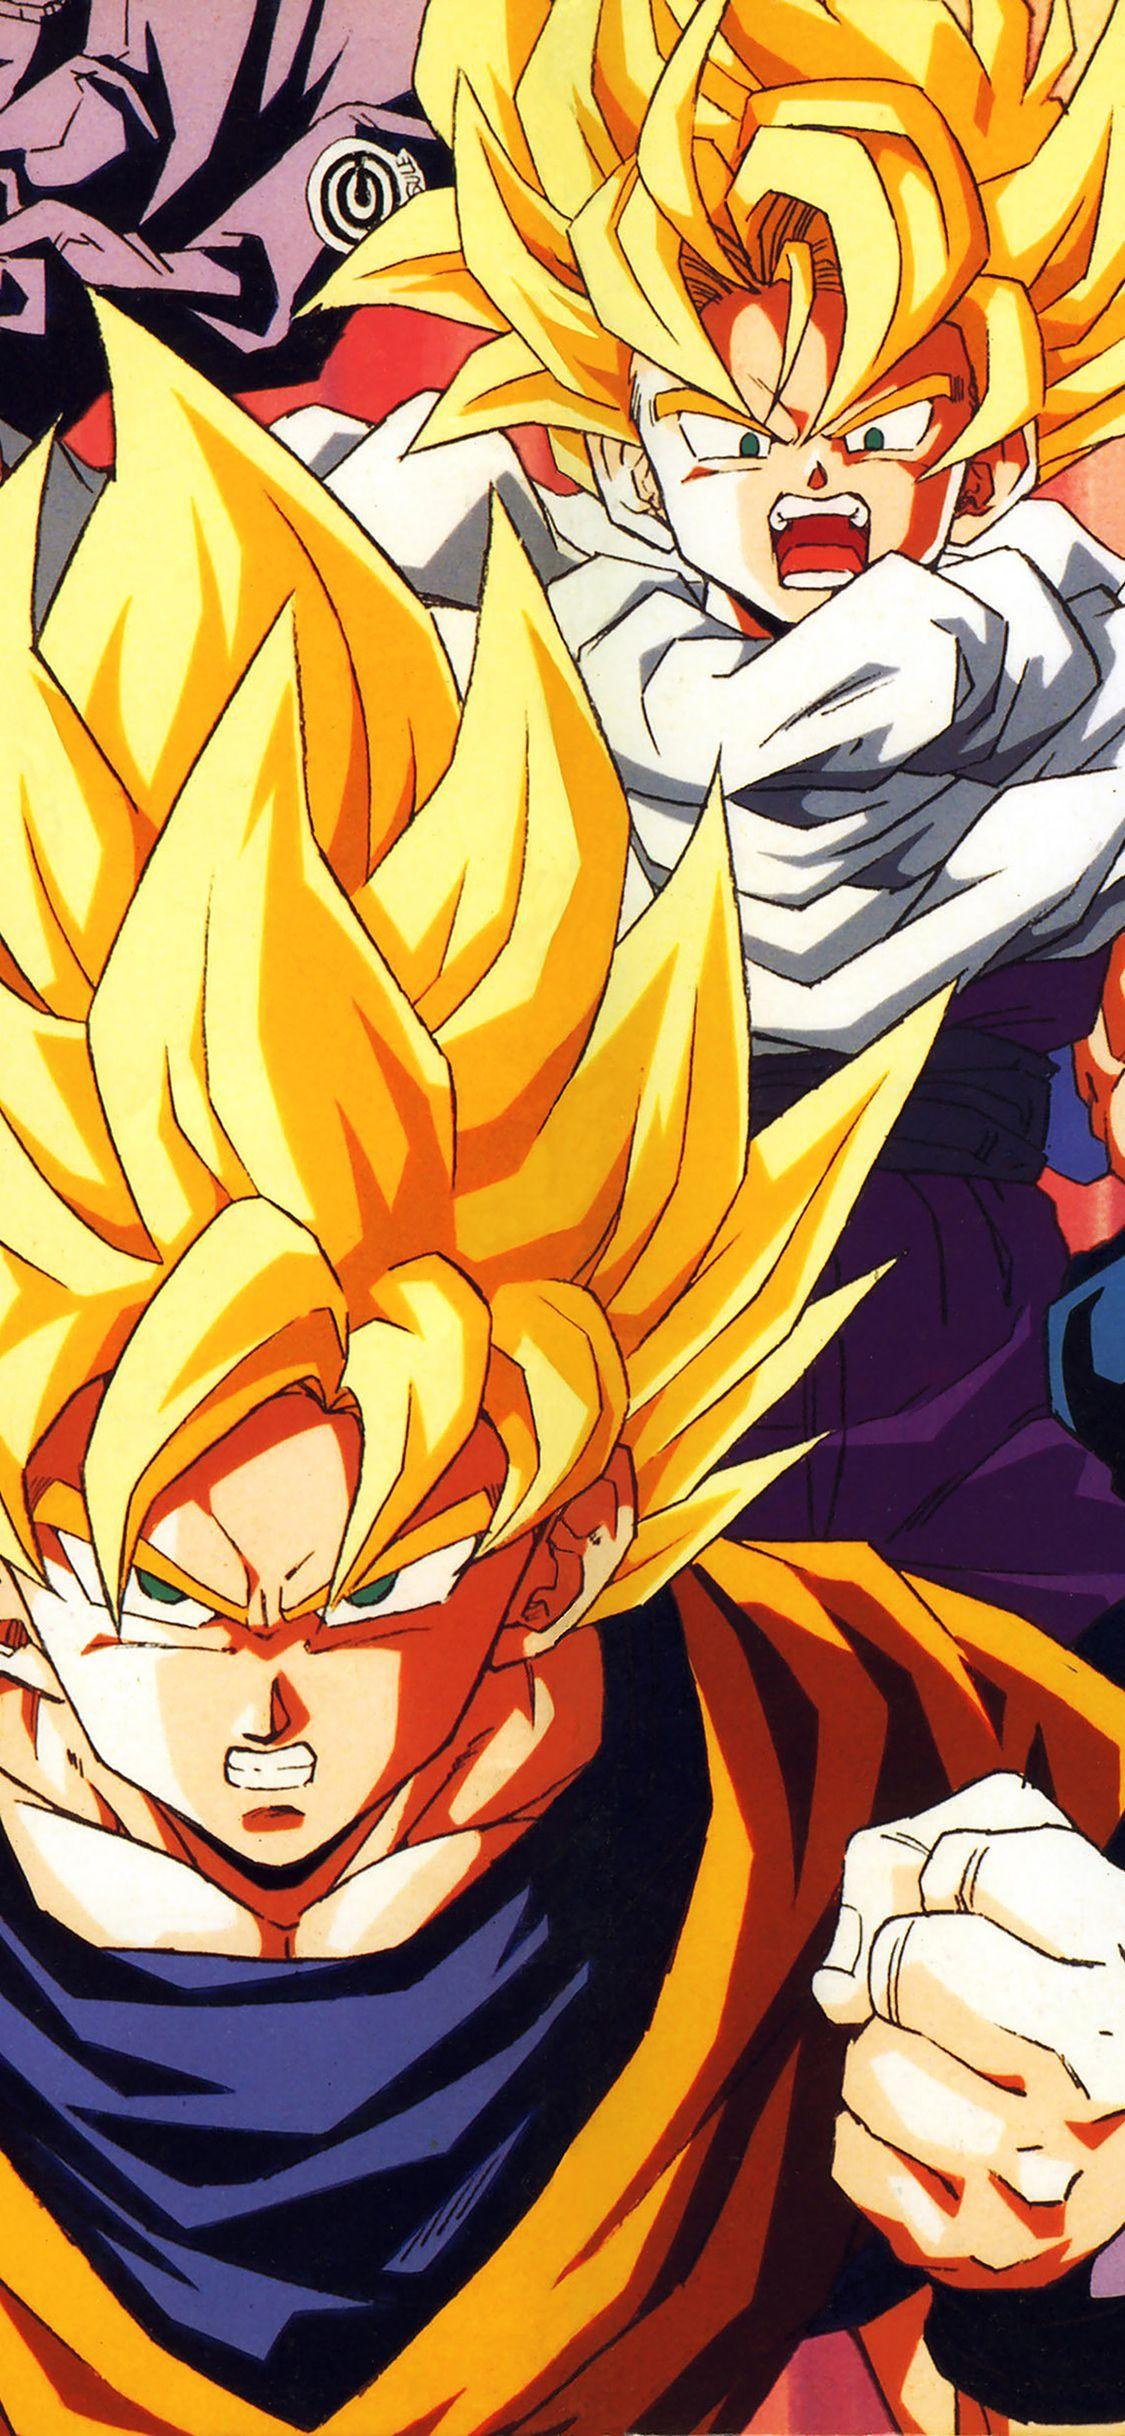 Goku Iphone 11 Wallpapers Wallpaper Cave